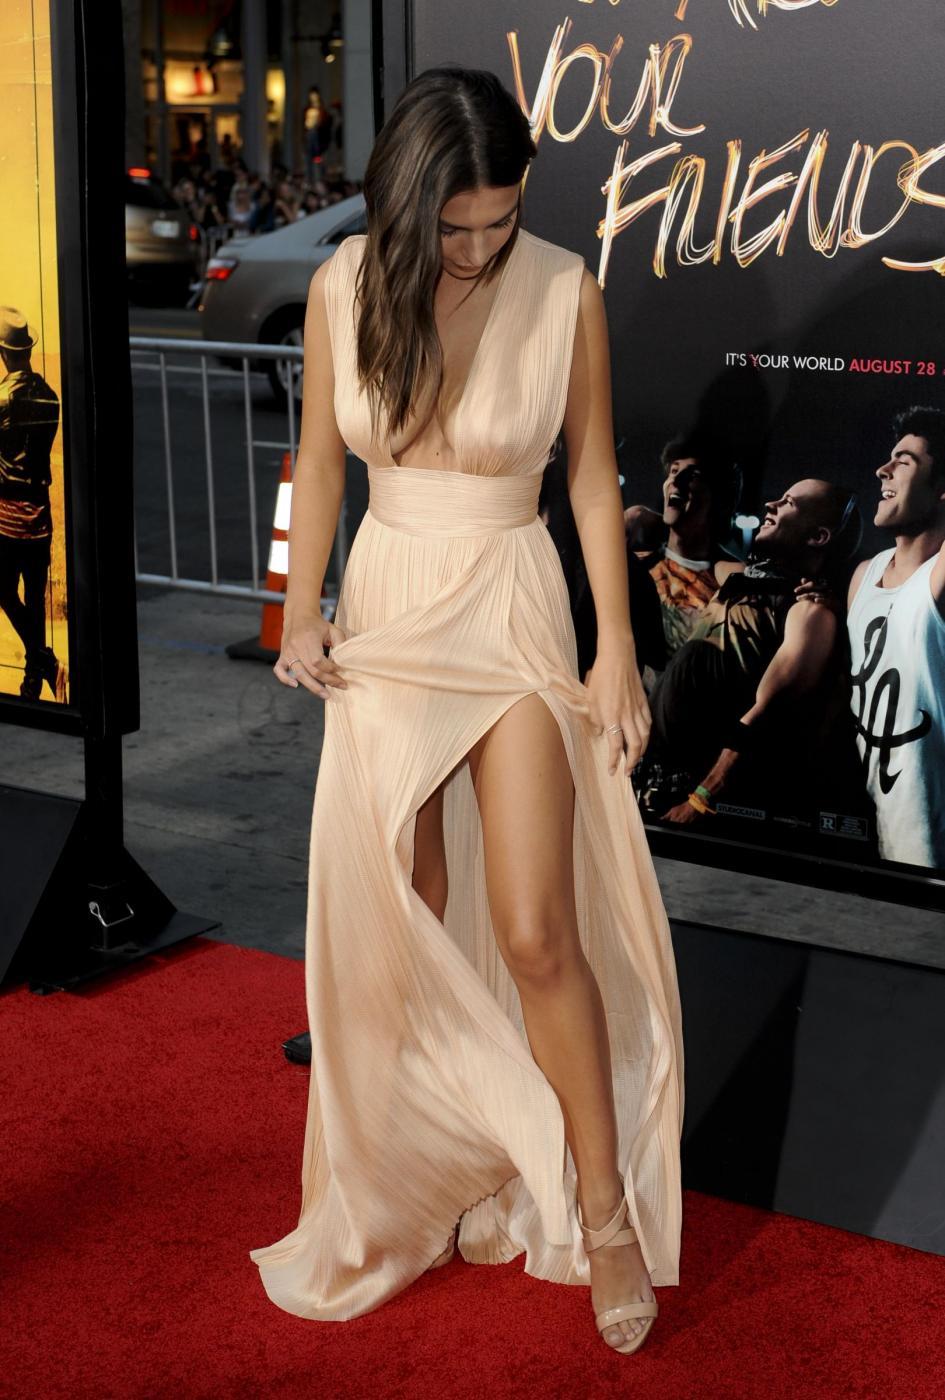 Emily Ratajkowski: scollatura da urlo a Hollywood FOTO 8